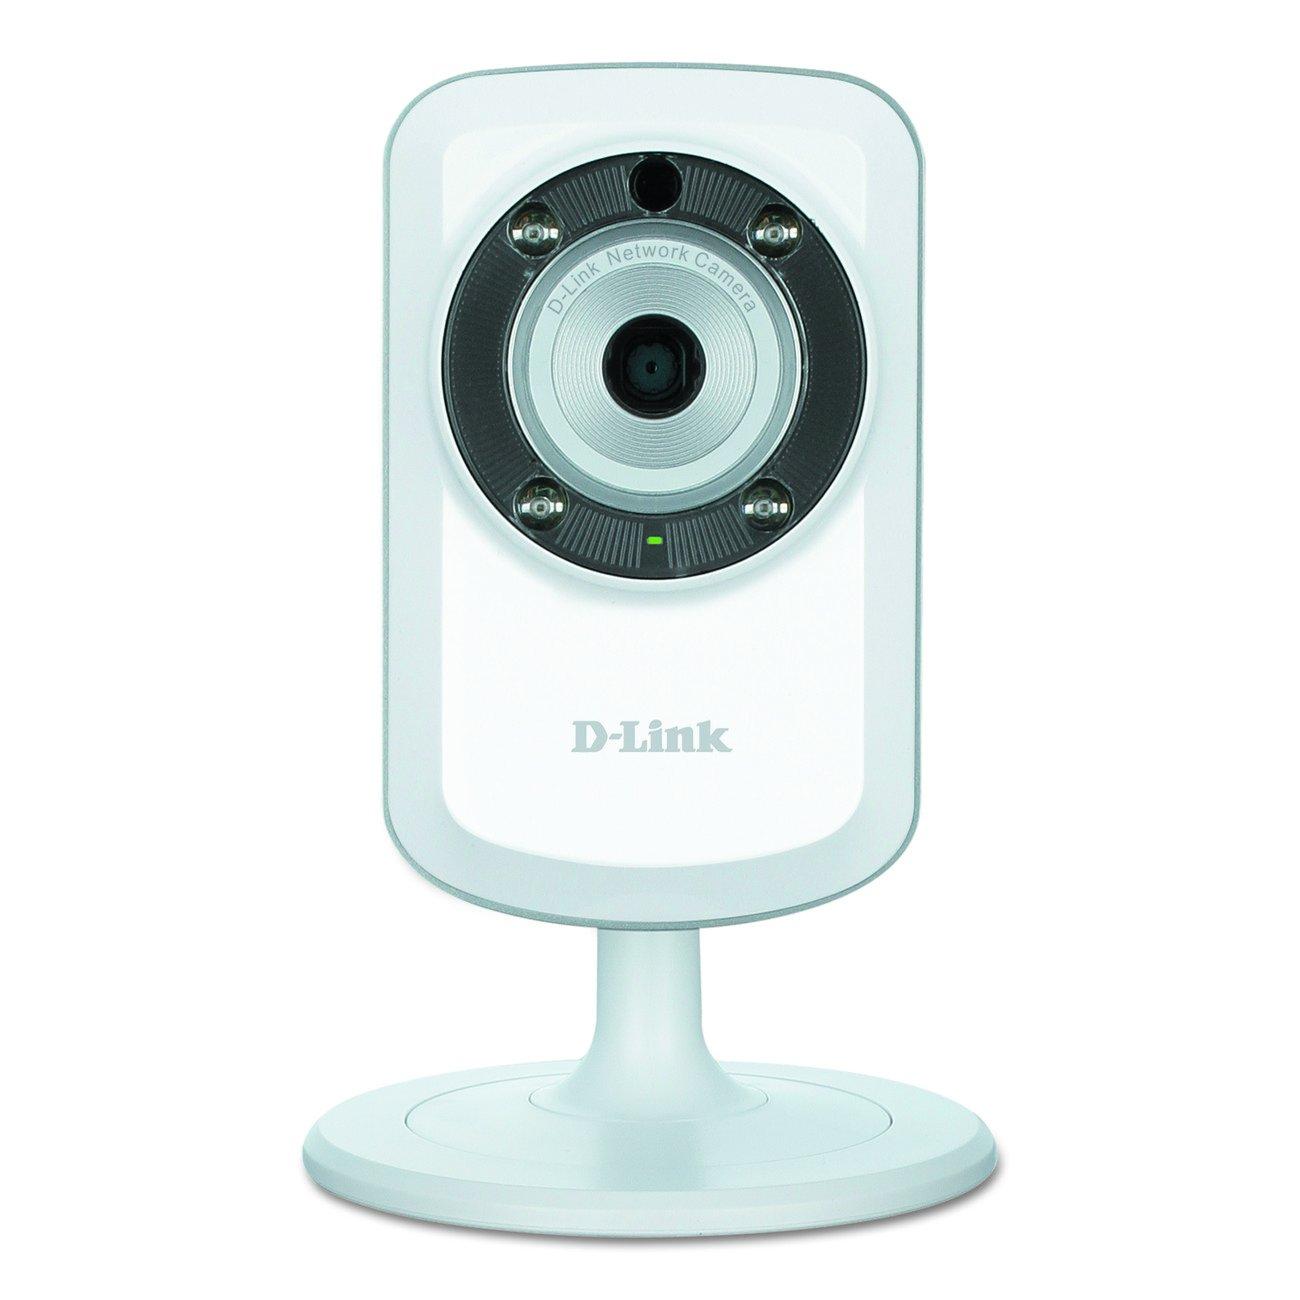 Amazon.com : D-Link DCS-933L Day & Night Wi-Fi Camera with Wi-Fi ...